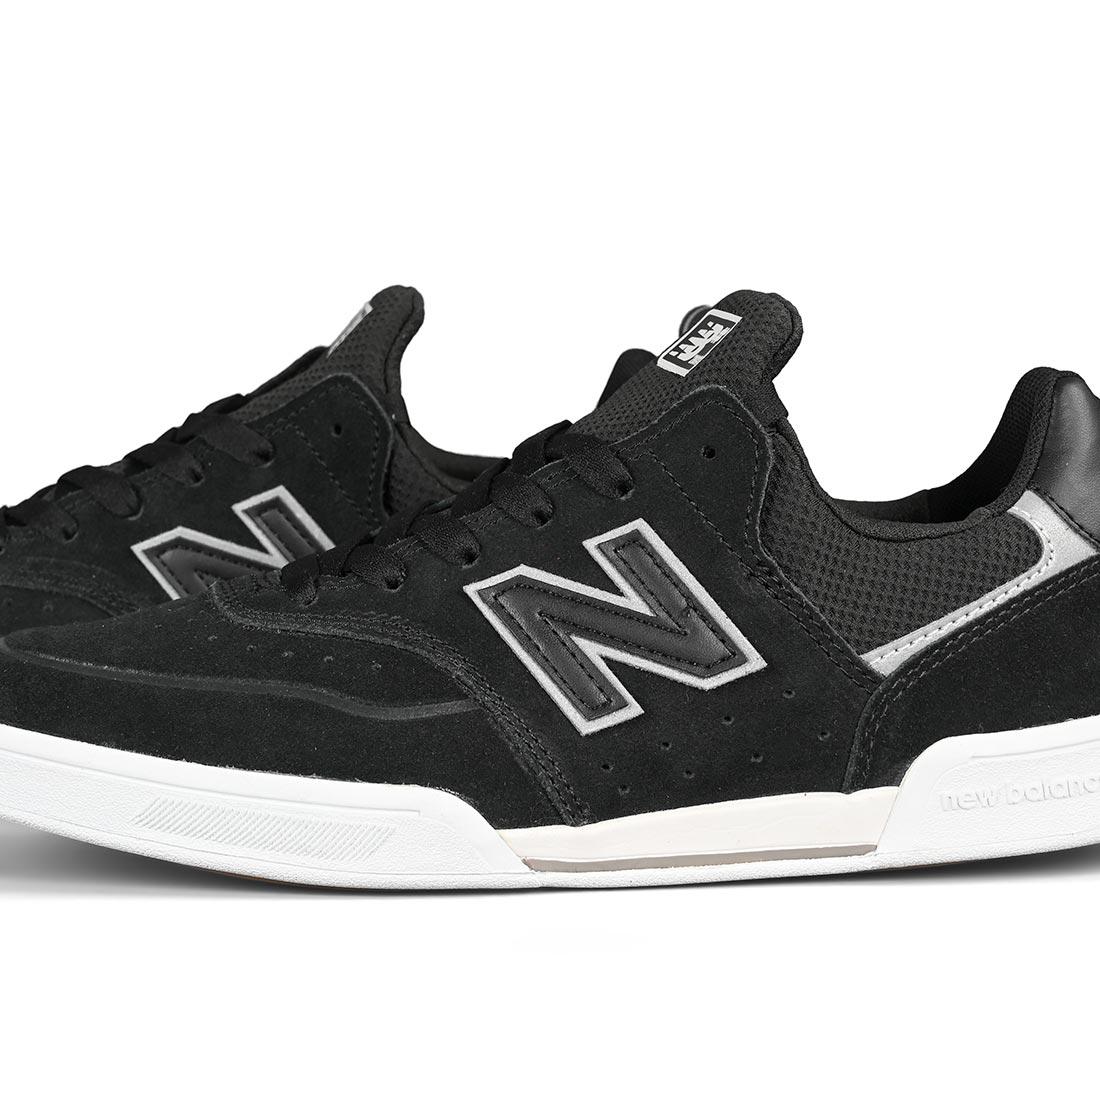 Marco Polo Cuatro Enciclopedia  New Balance Numeric 288 Shoes - Black / White | Supereight.net